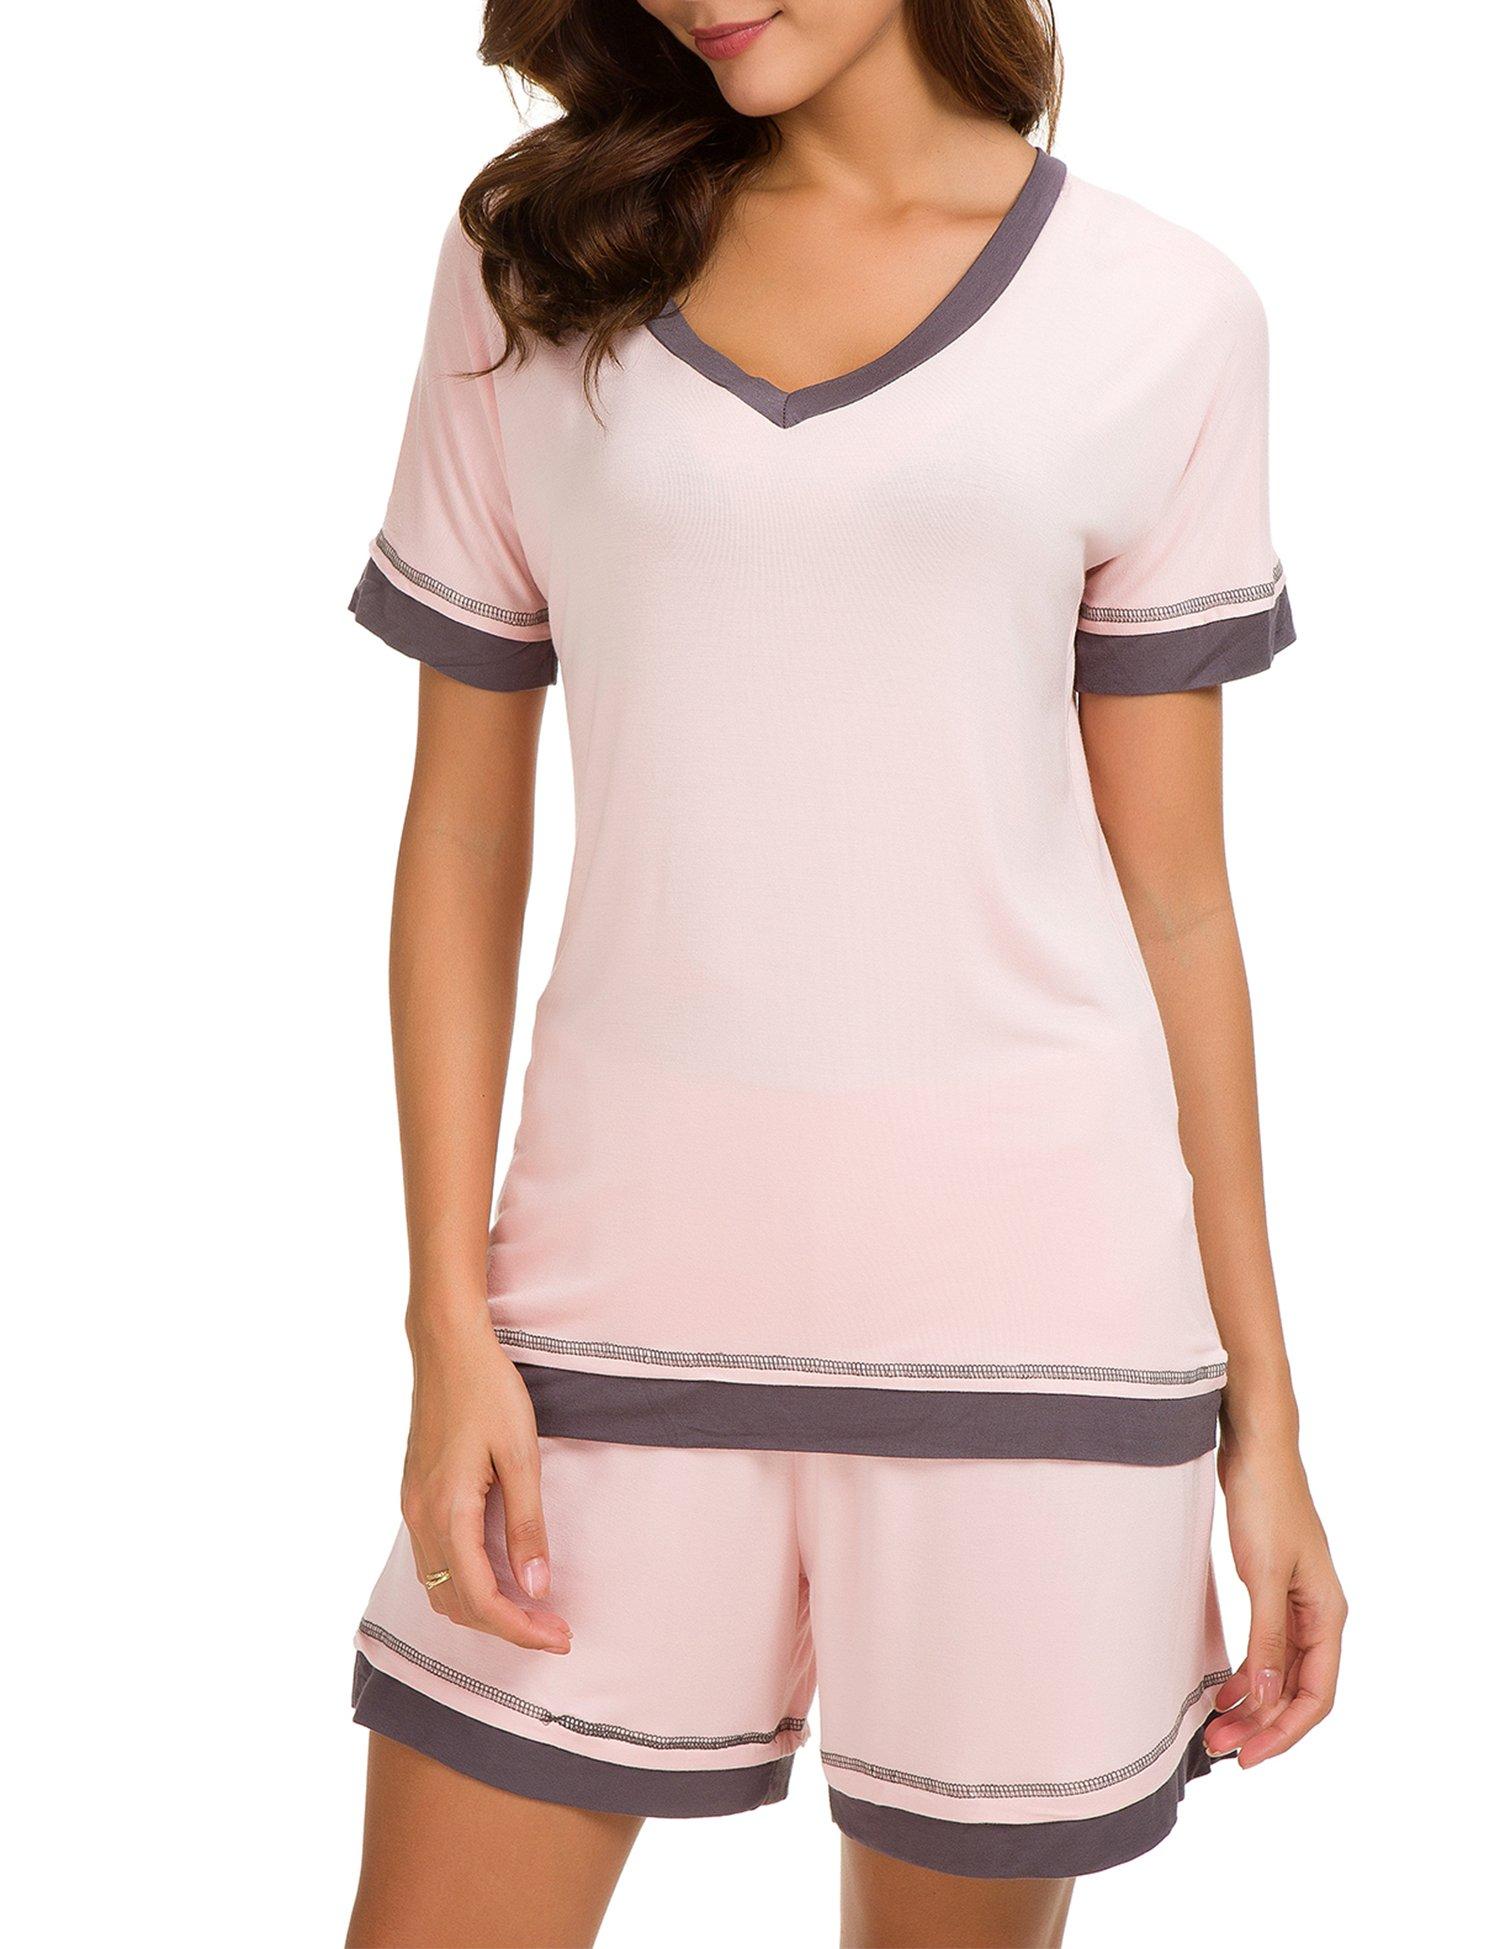 Dolay Short Pj Set Woman Cotton Knit Pajamas Summer Plus Size Sleepwear Nighty Sets (Pink, XXL)